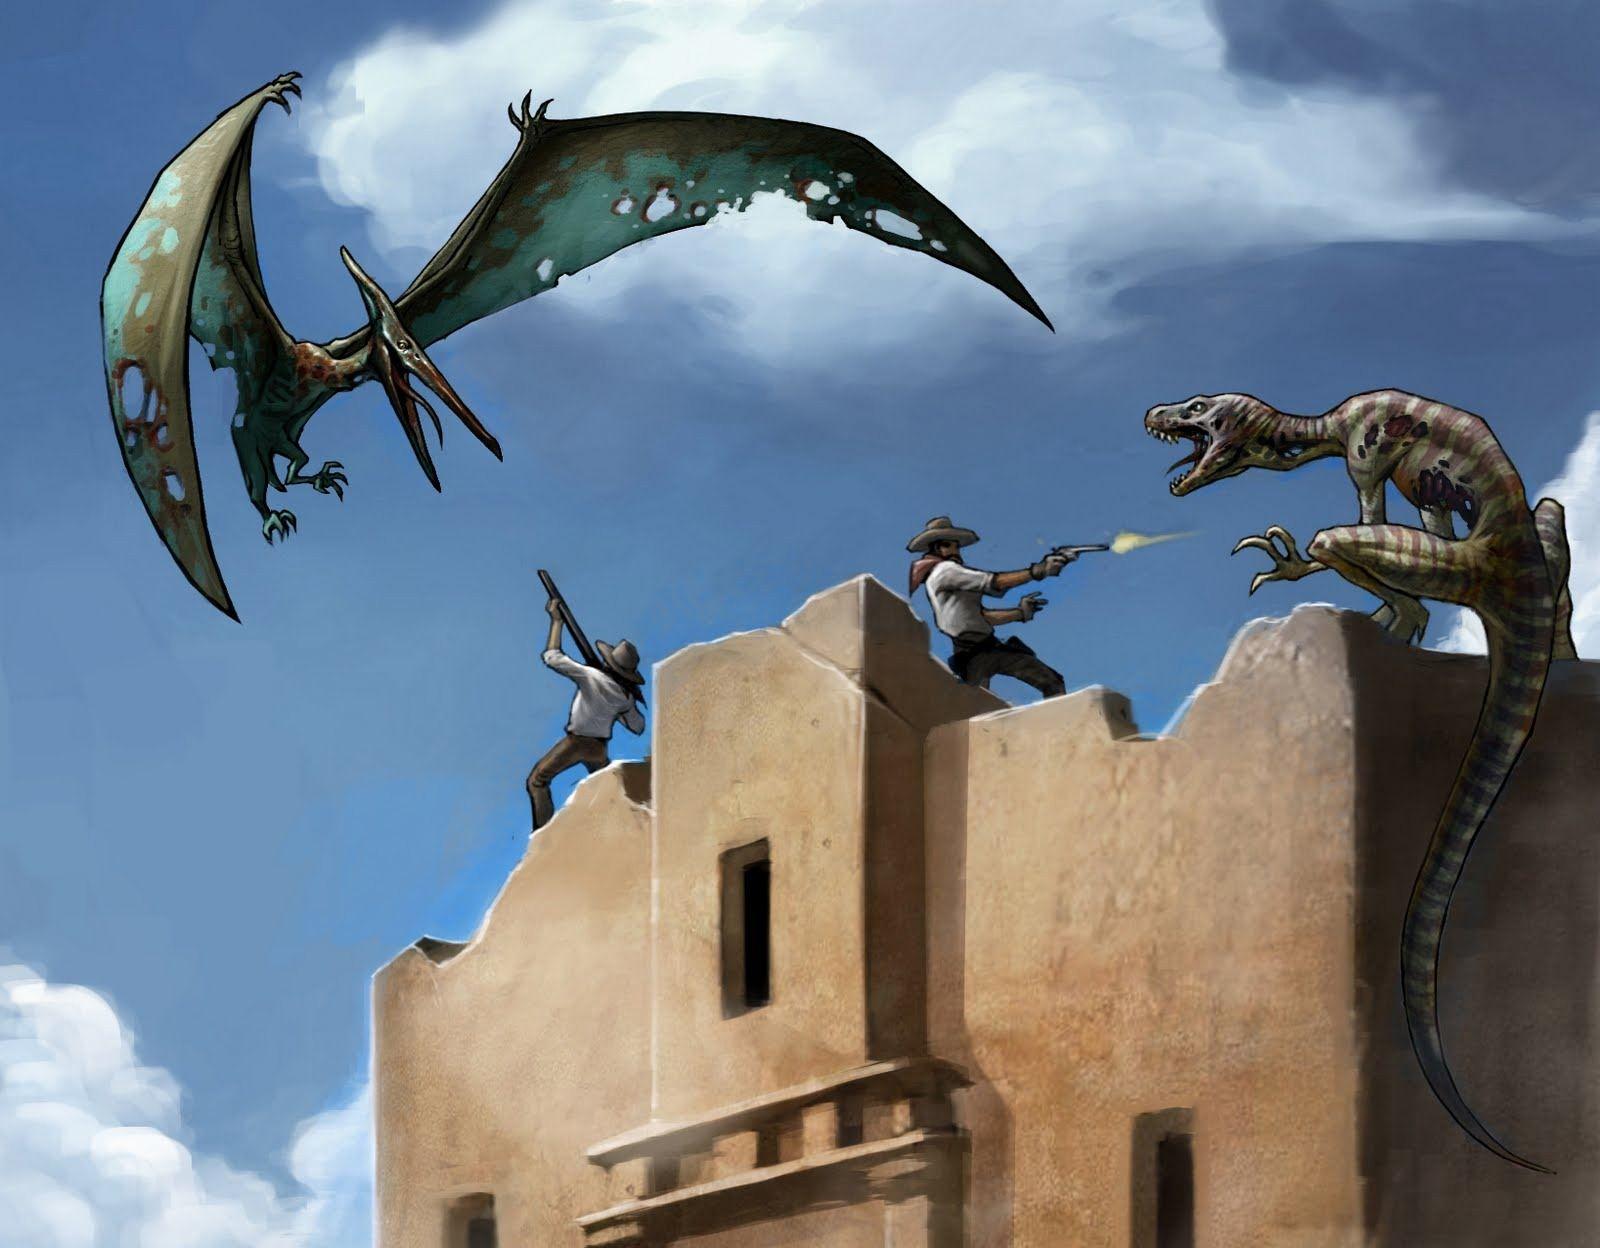 Cowboys vs Dinosaurs.. at the Alamo! Mysterious universe